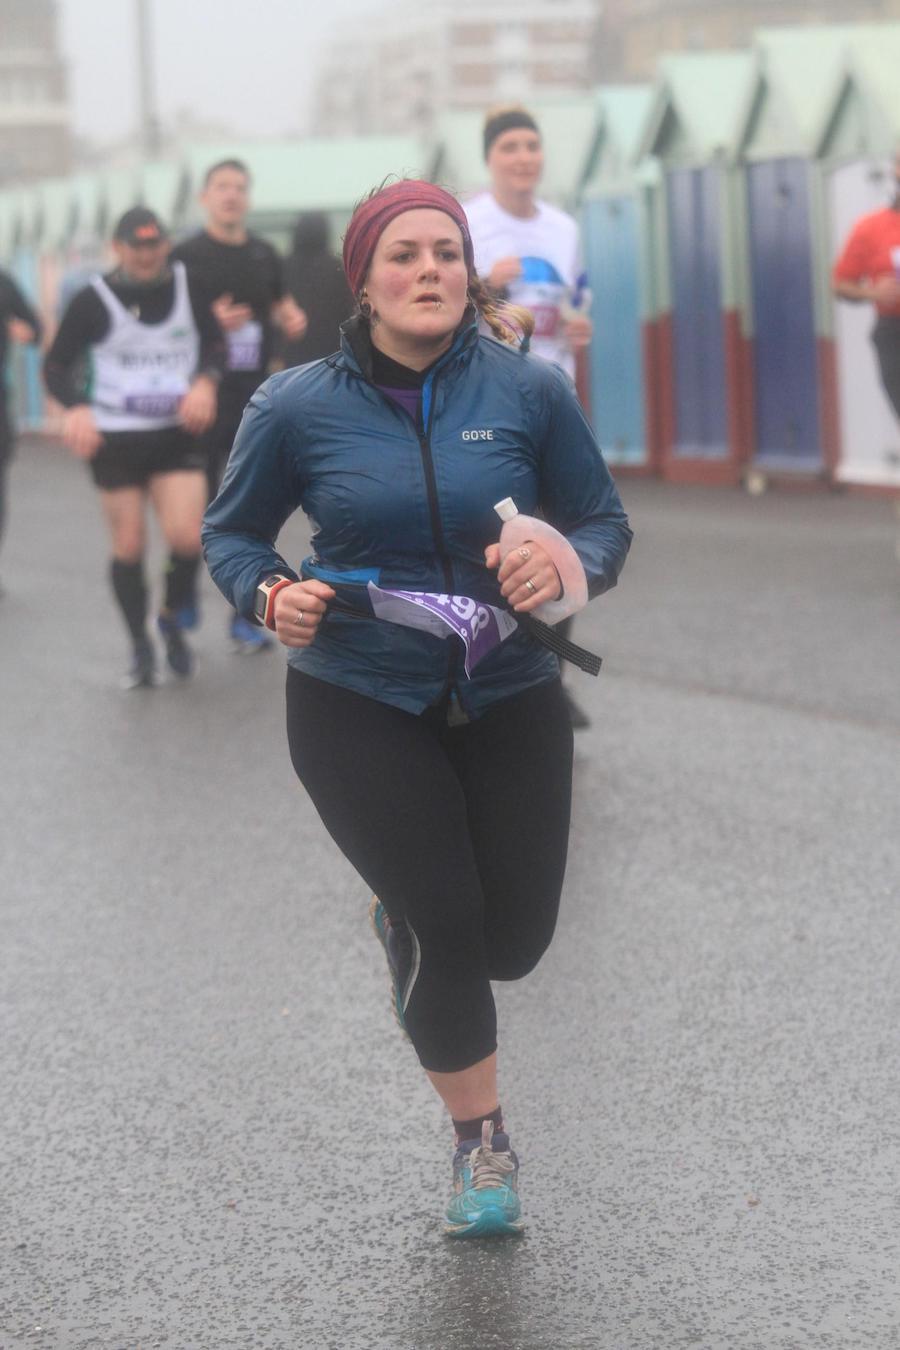 Runner running past beach huts during 2020 Brighton Half Marathon